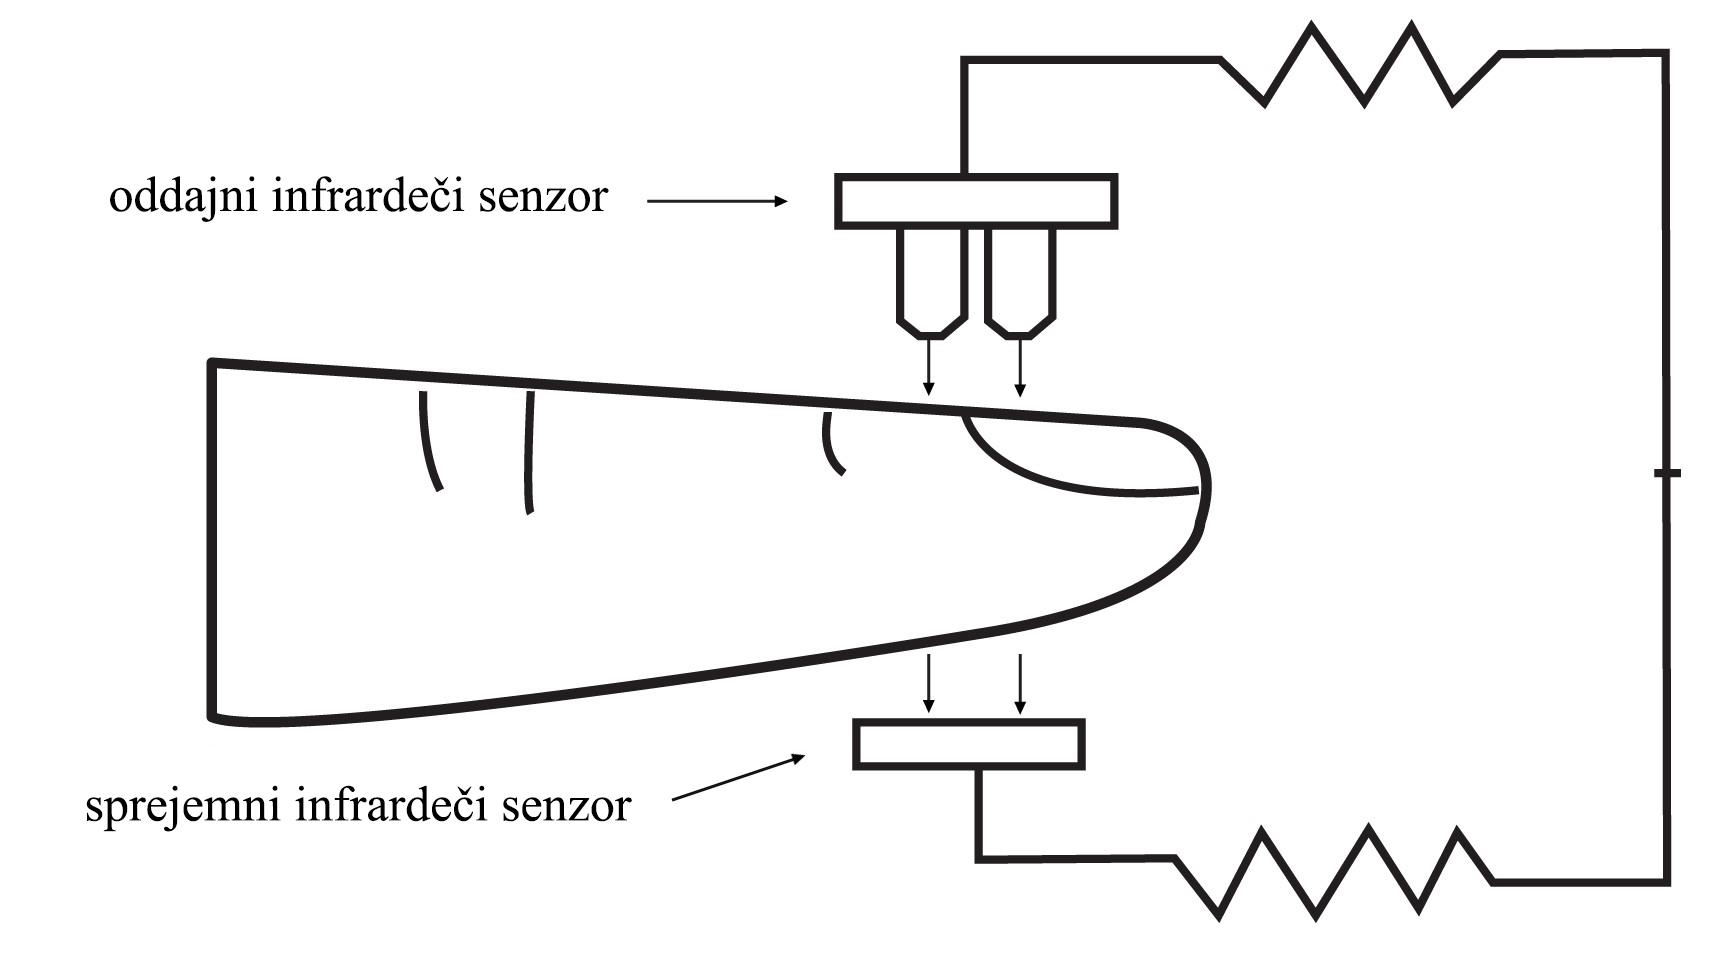 Pulzni oksimeter CMS